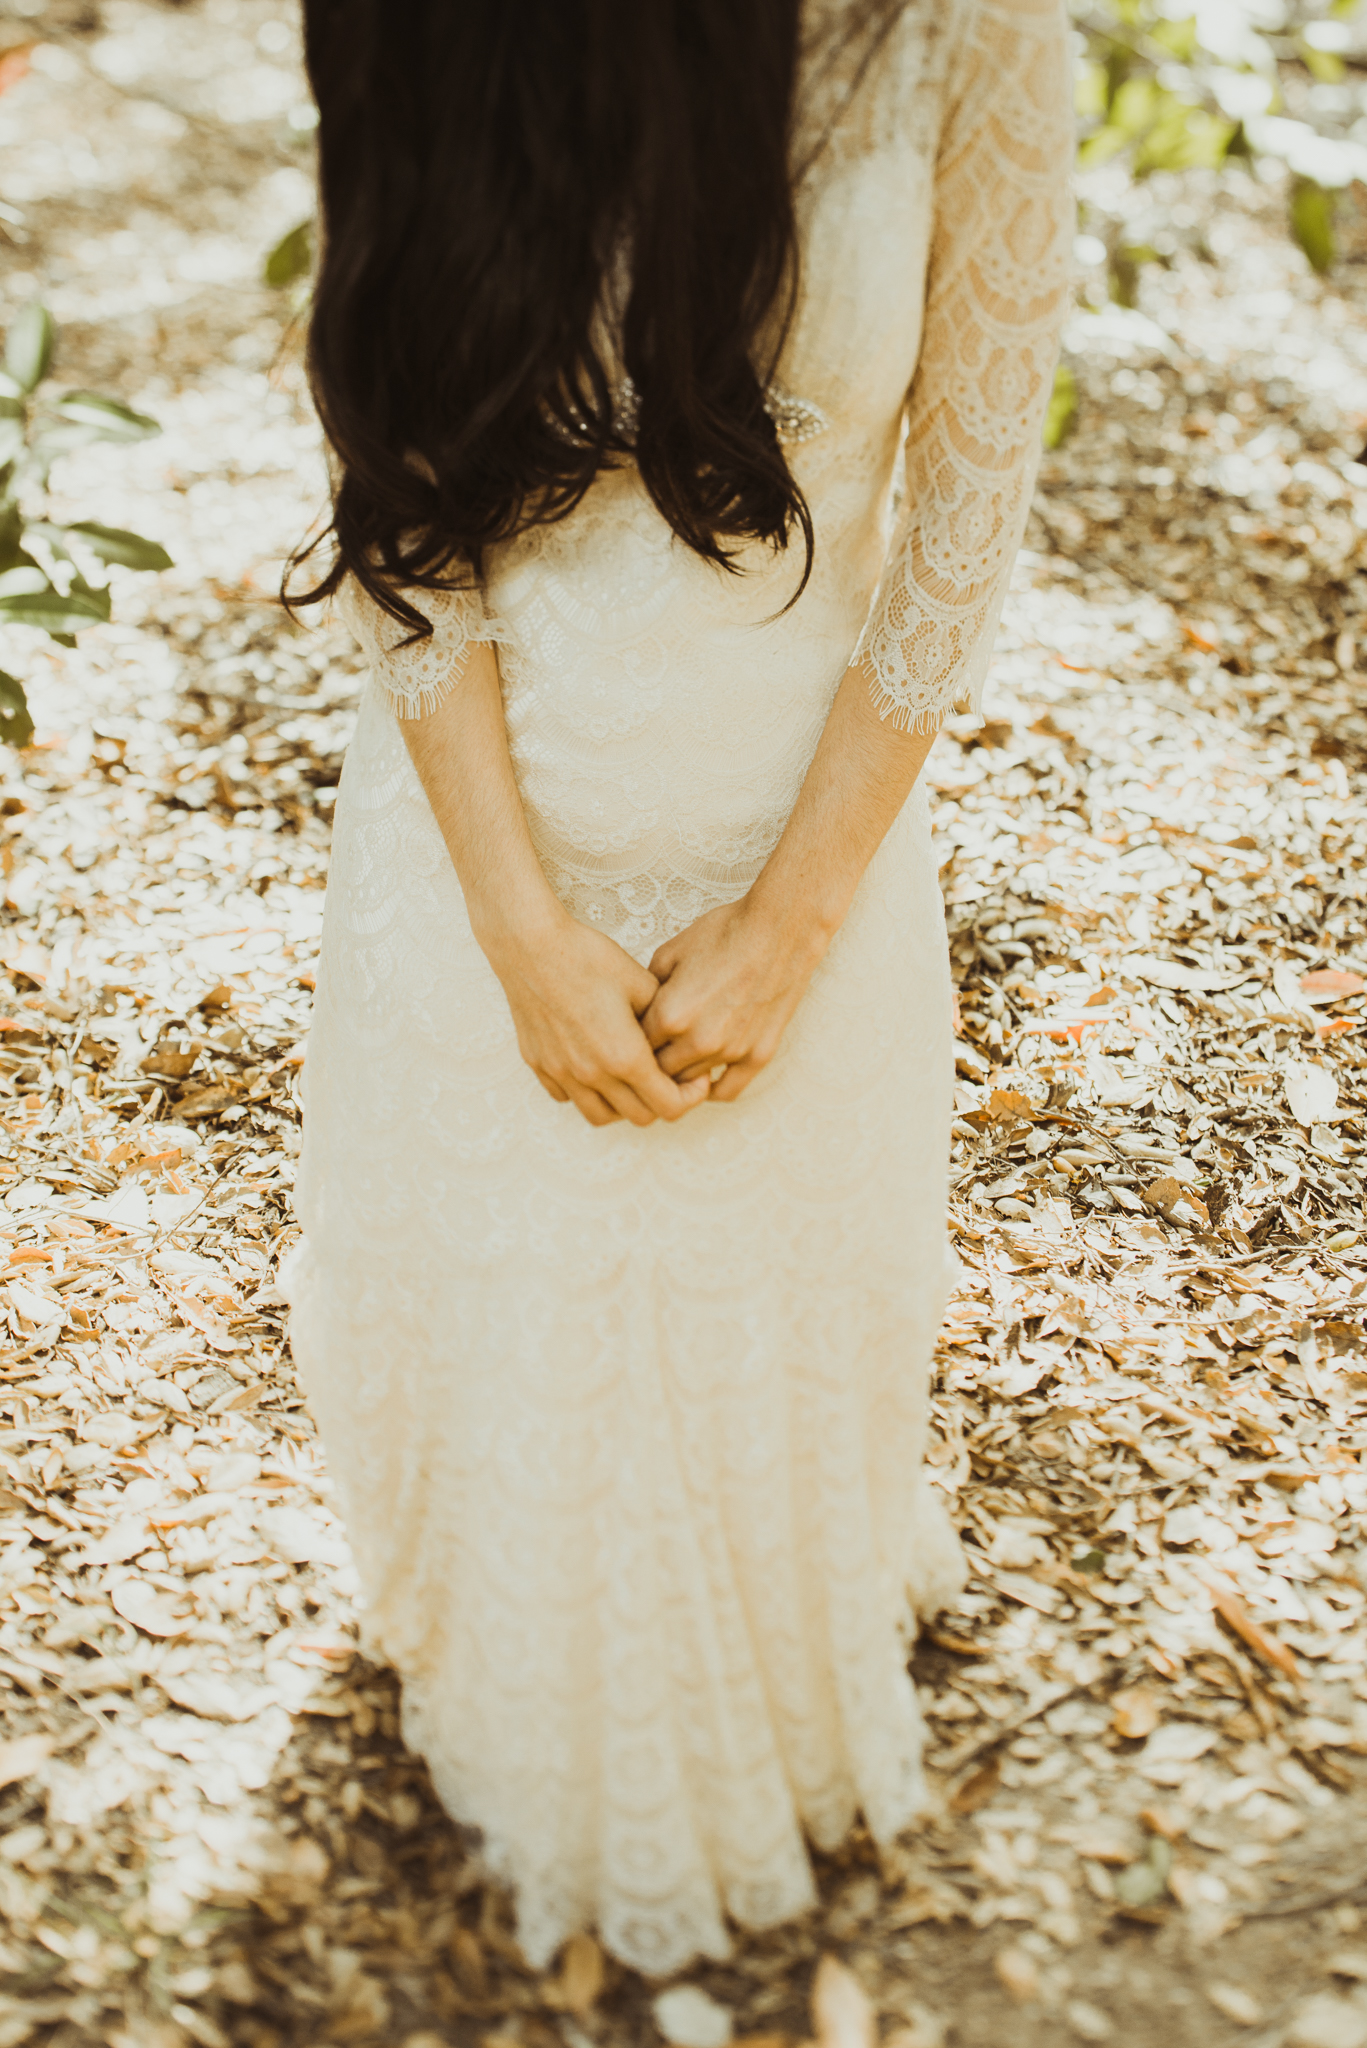 ©Isaiah-&-Taylor-Photography---Oak-Canyon-Nature-Center-Wedding,-Anaheim-Hills-002.jpg